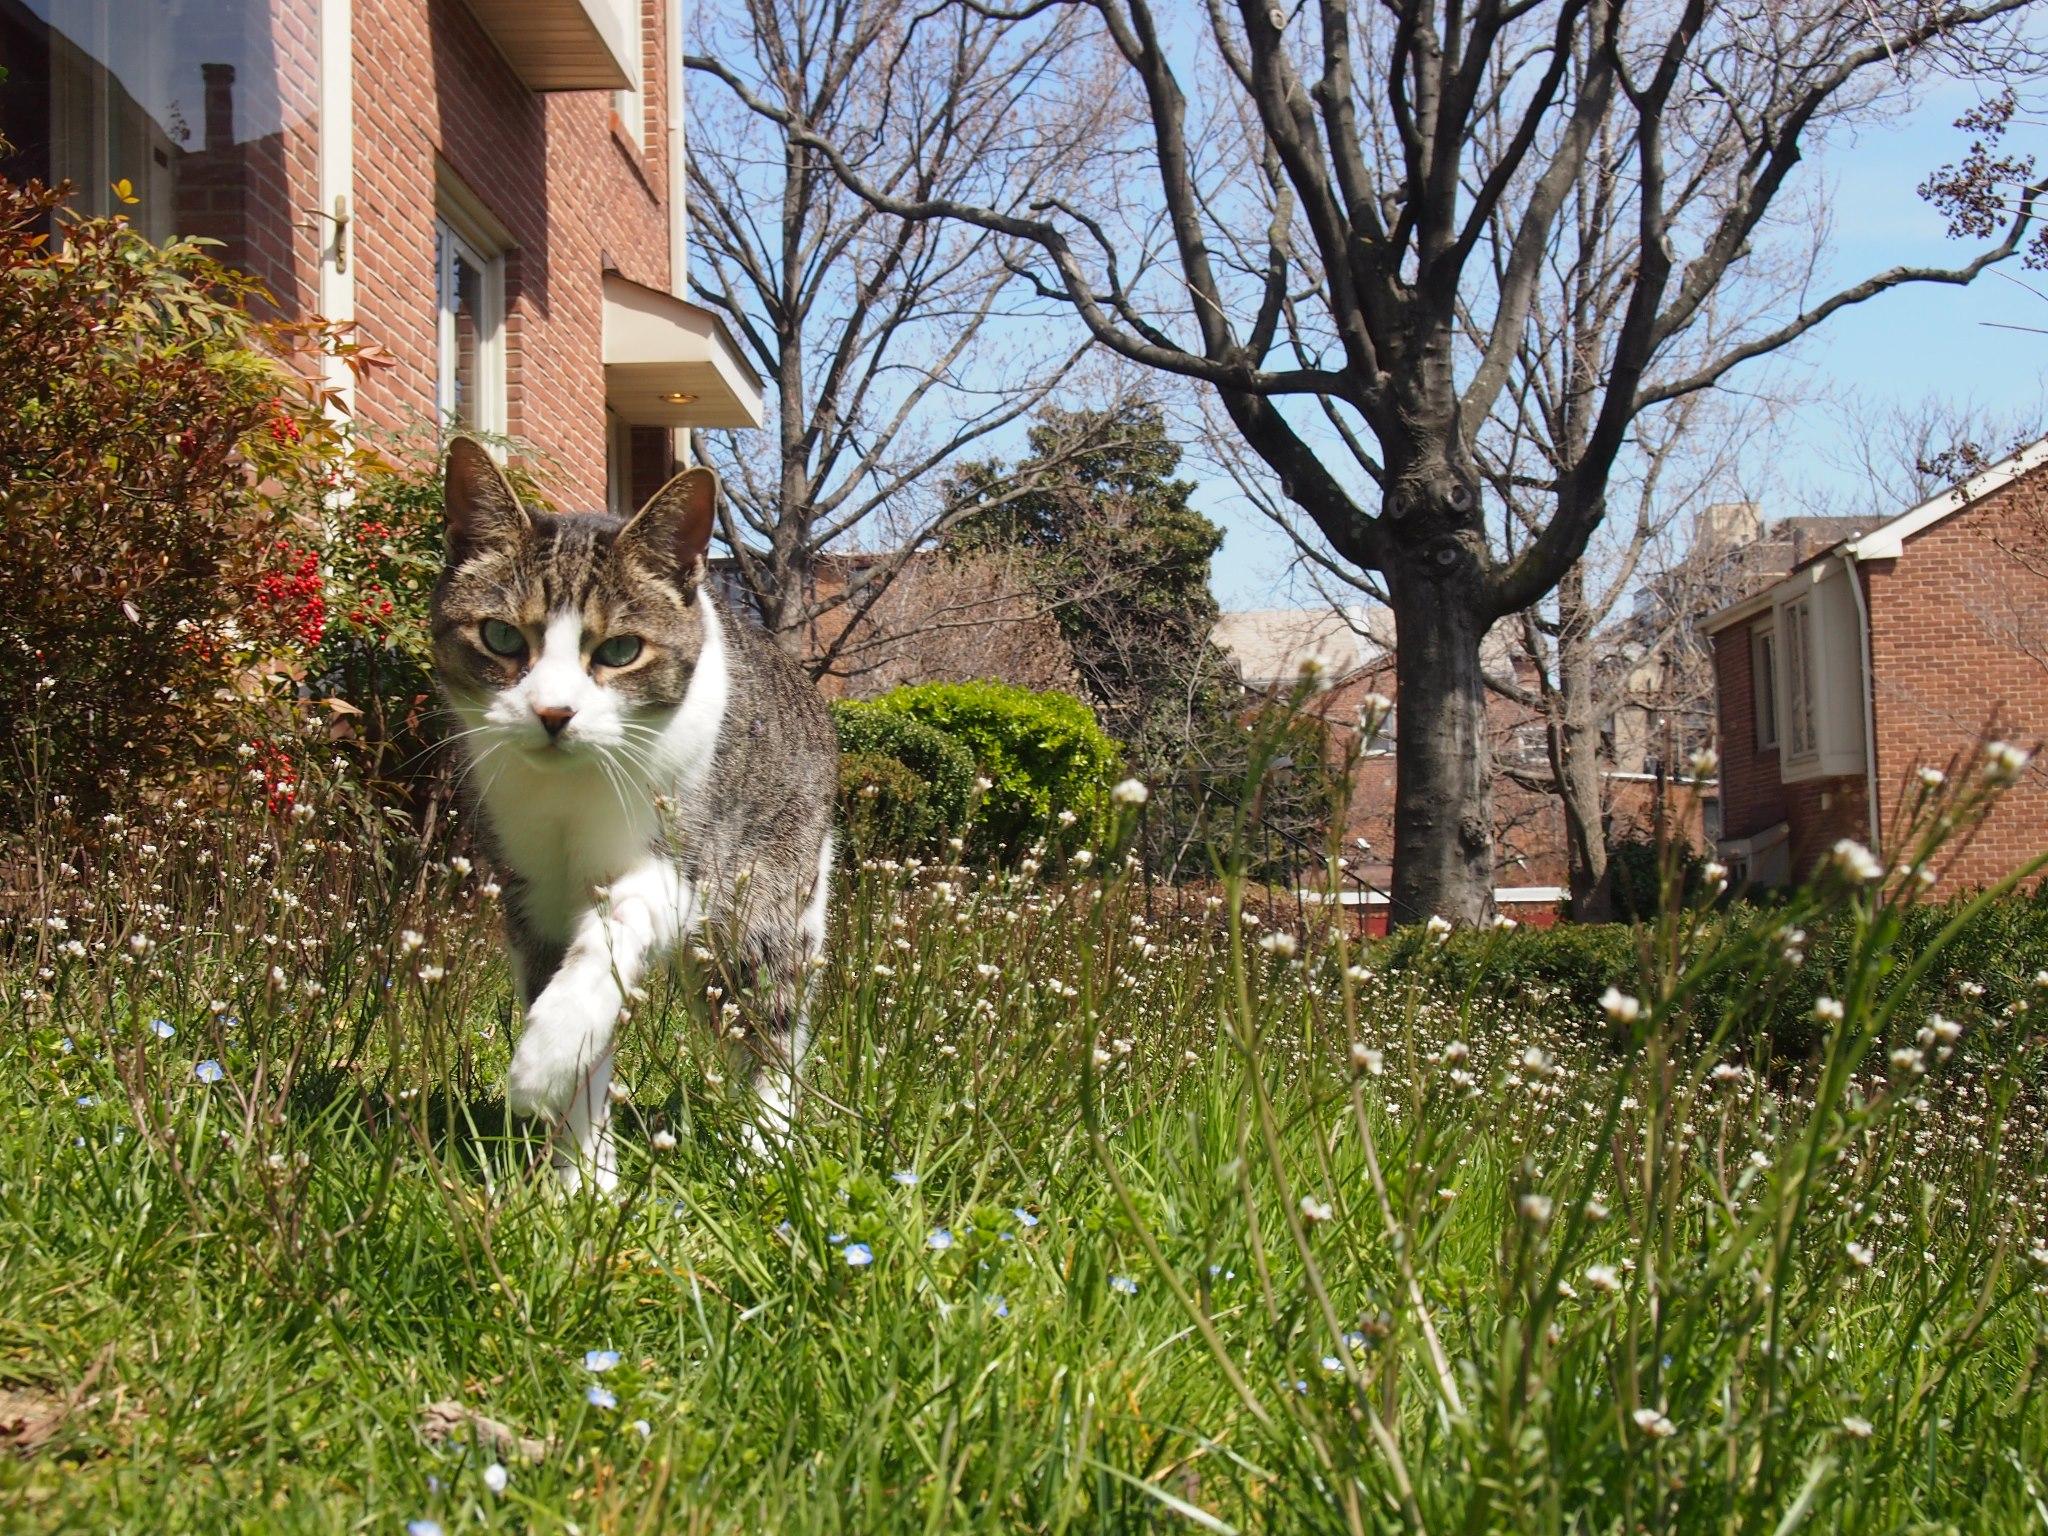 Jasper in the great outdoors (Credit: David Grimm)